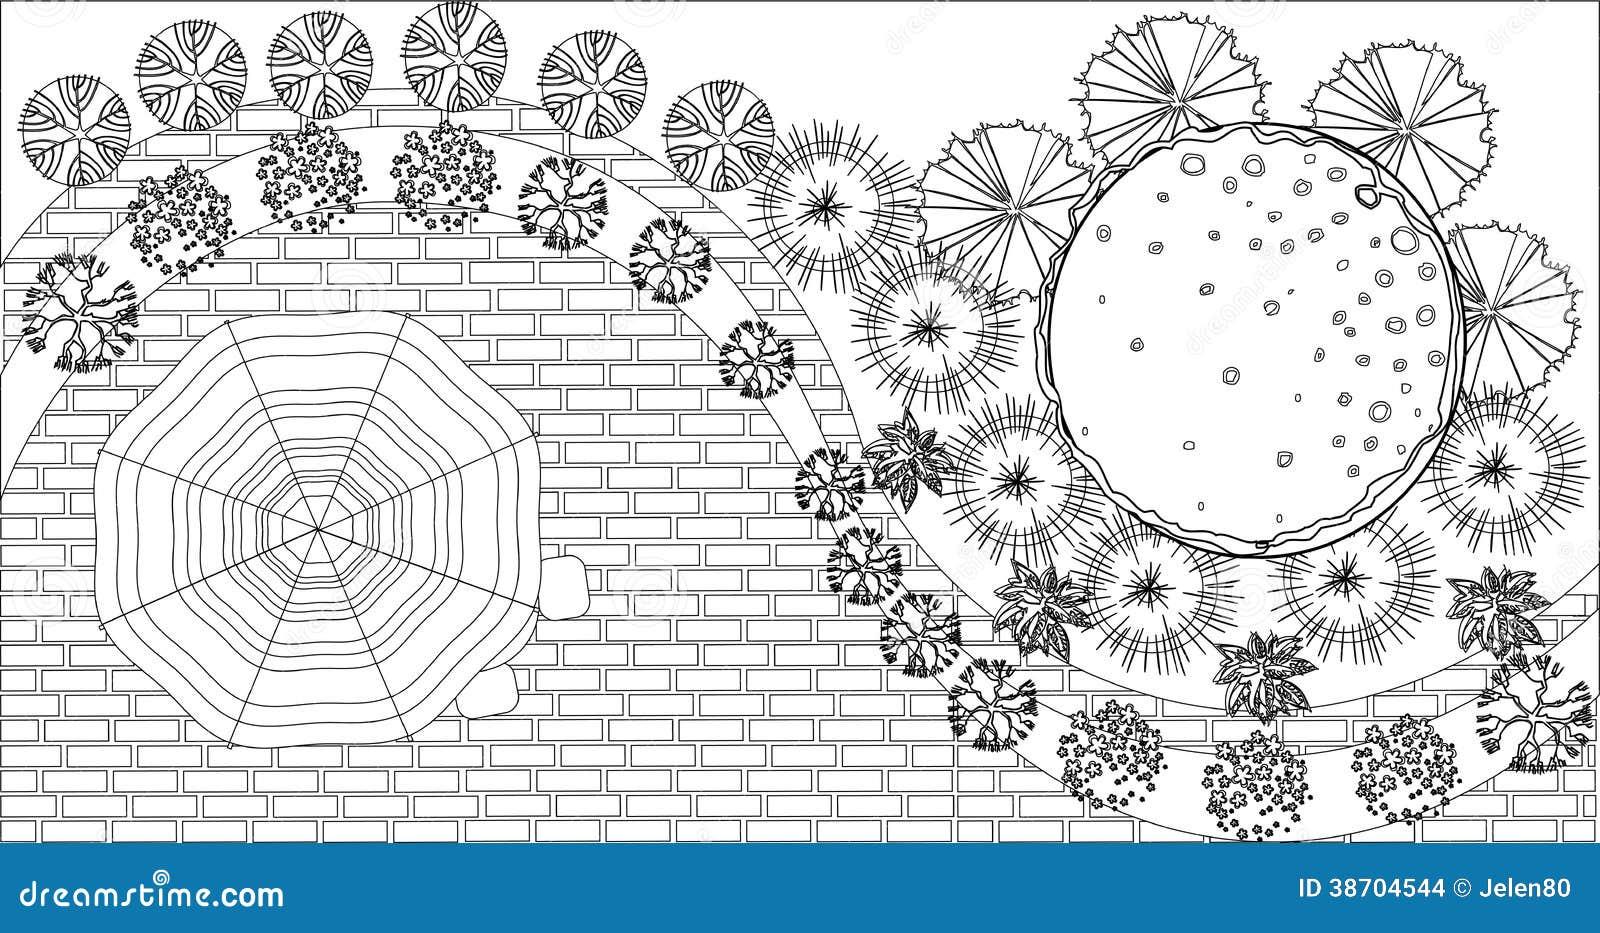 How To Read Floor Plans Symbols Vector Landscape Pla Stock Images Image 38704544